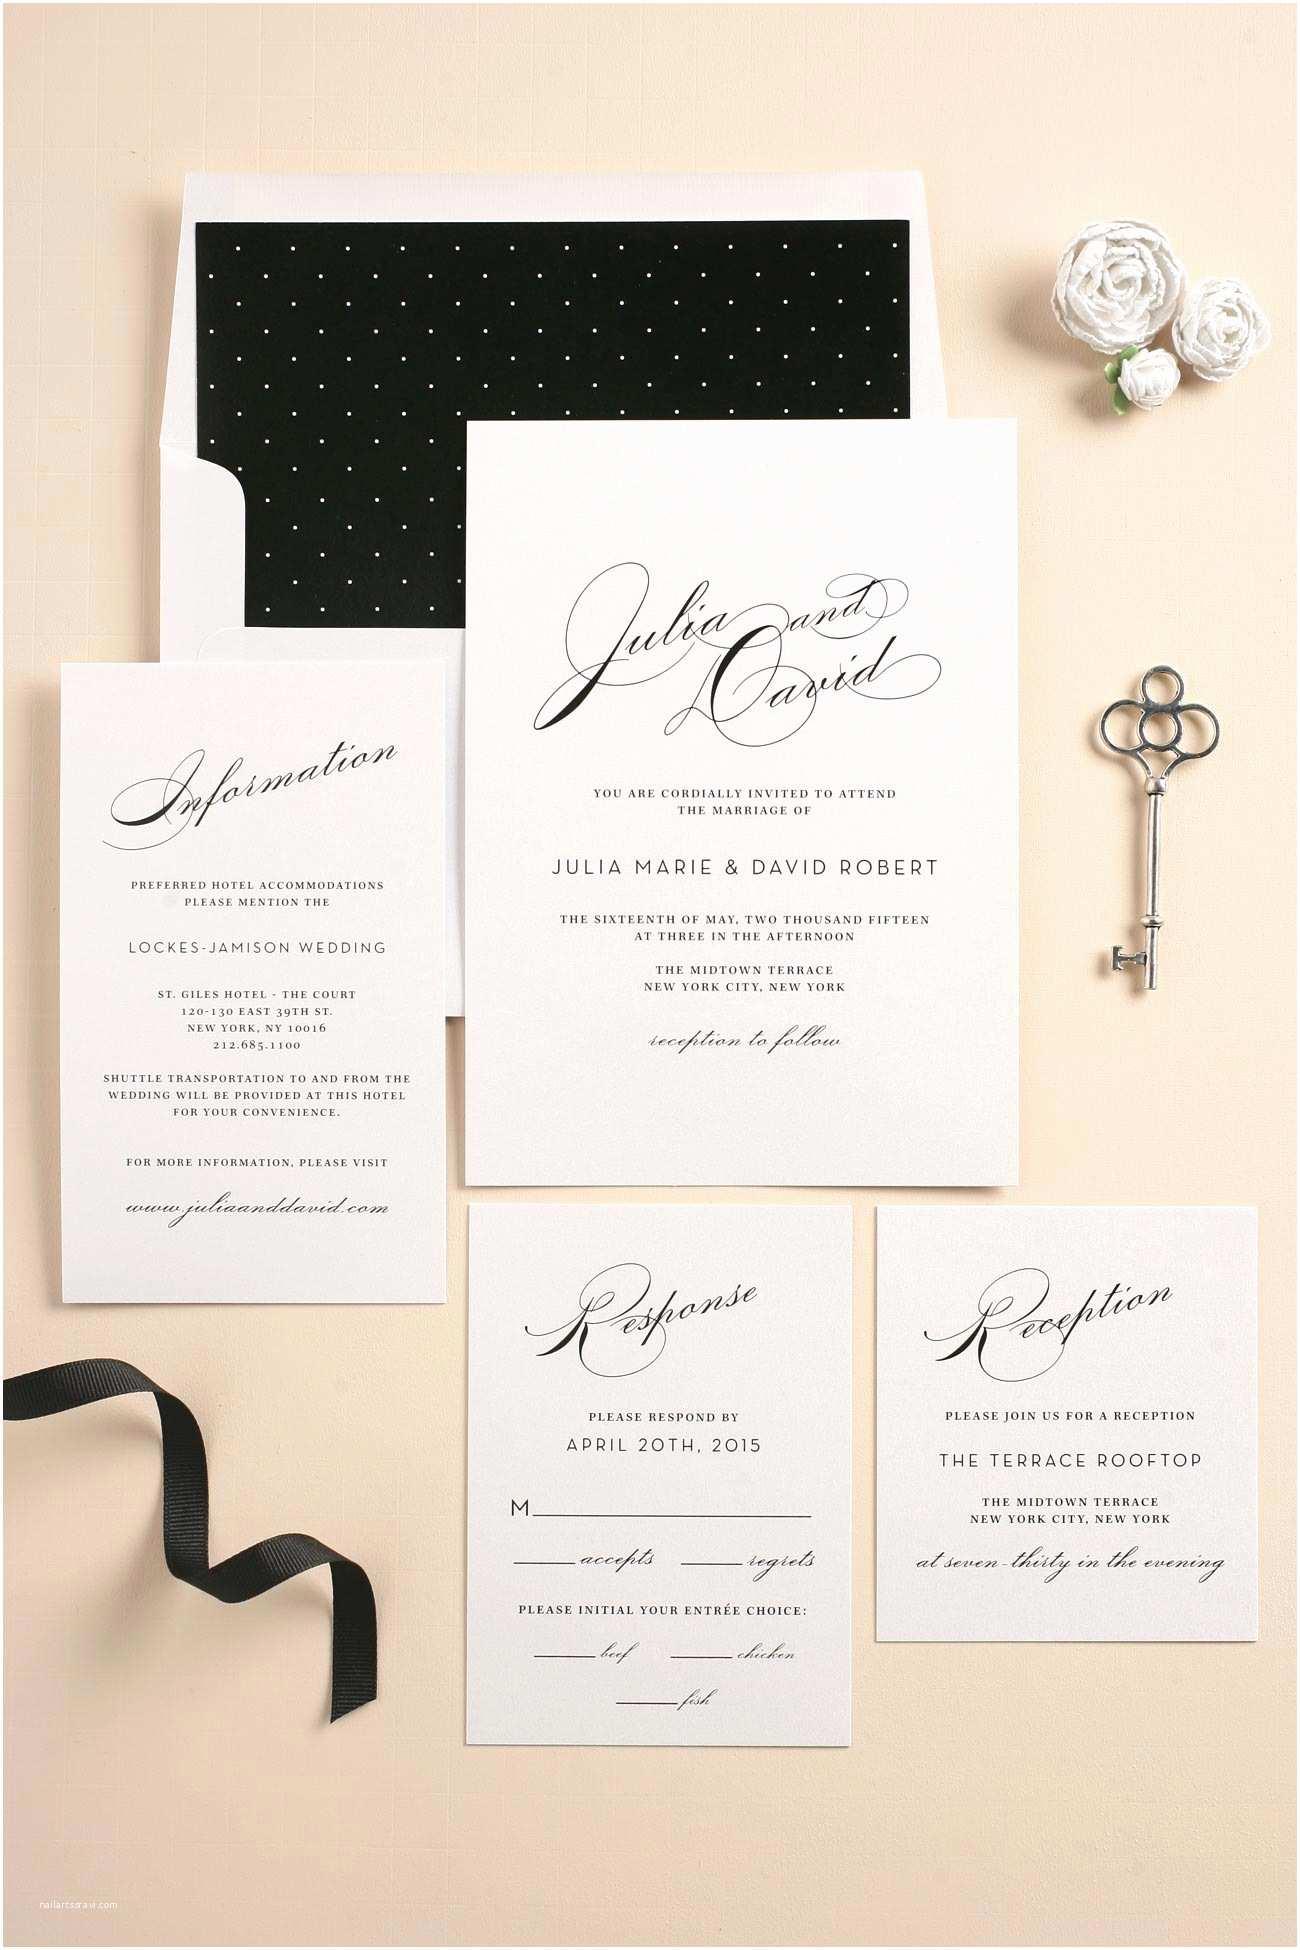 Kate Spade Wedding Invitations top Album Kate Spade Wedding Invitations